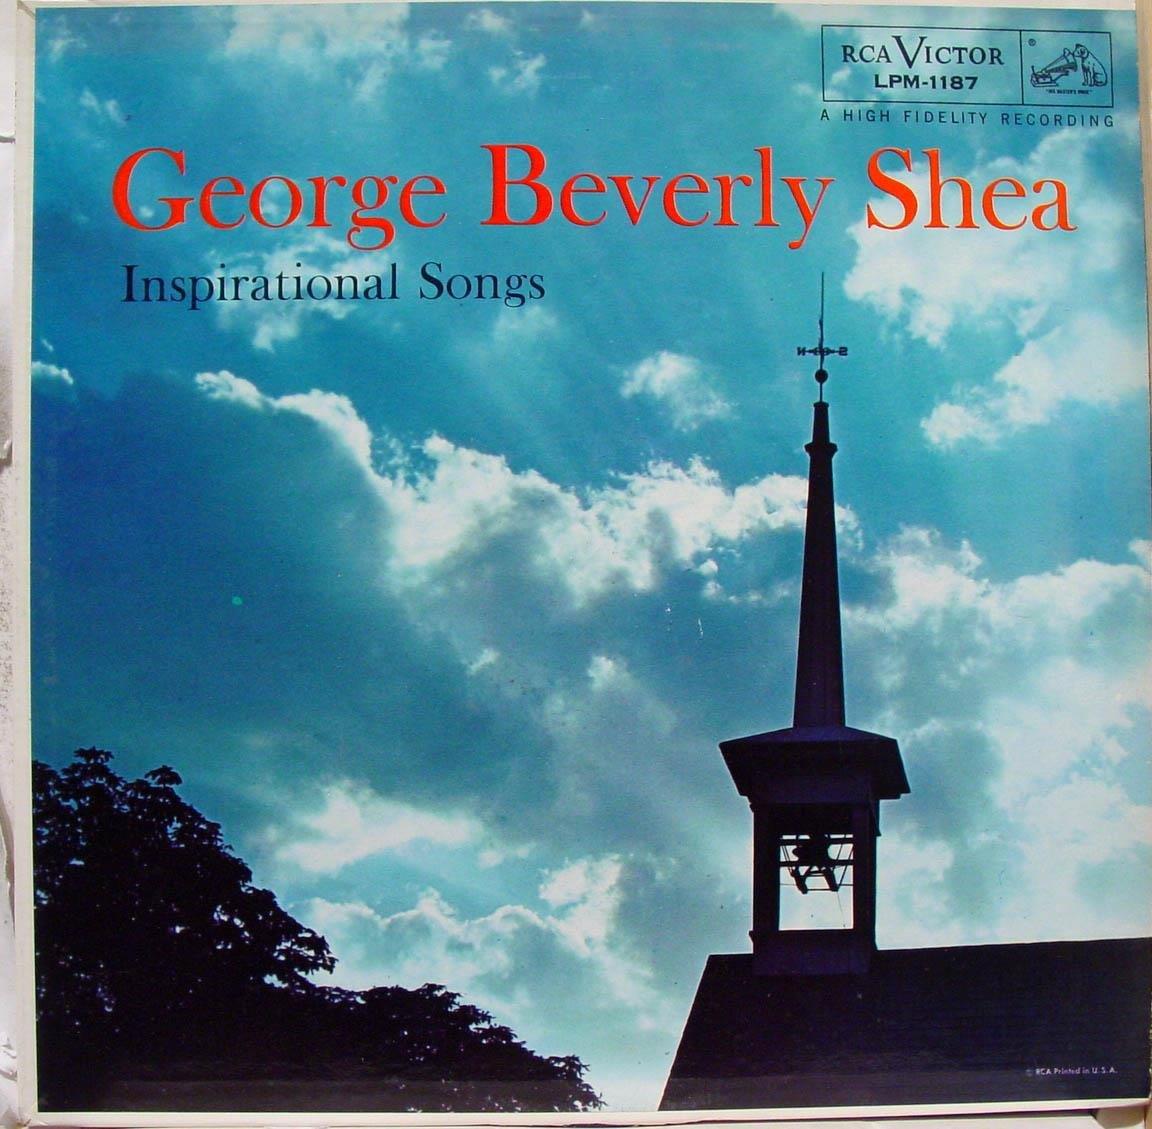 George Beverly Shea Inspirational Songs Record Vinyl Album HiFi Sound